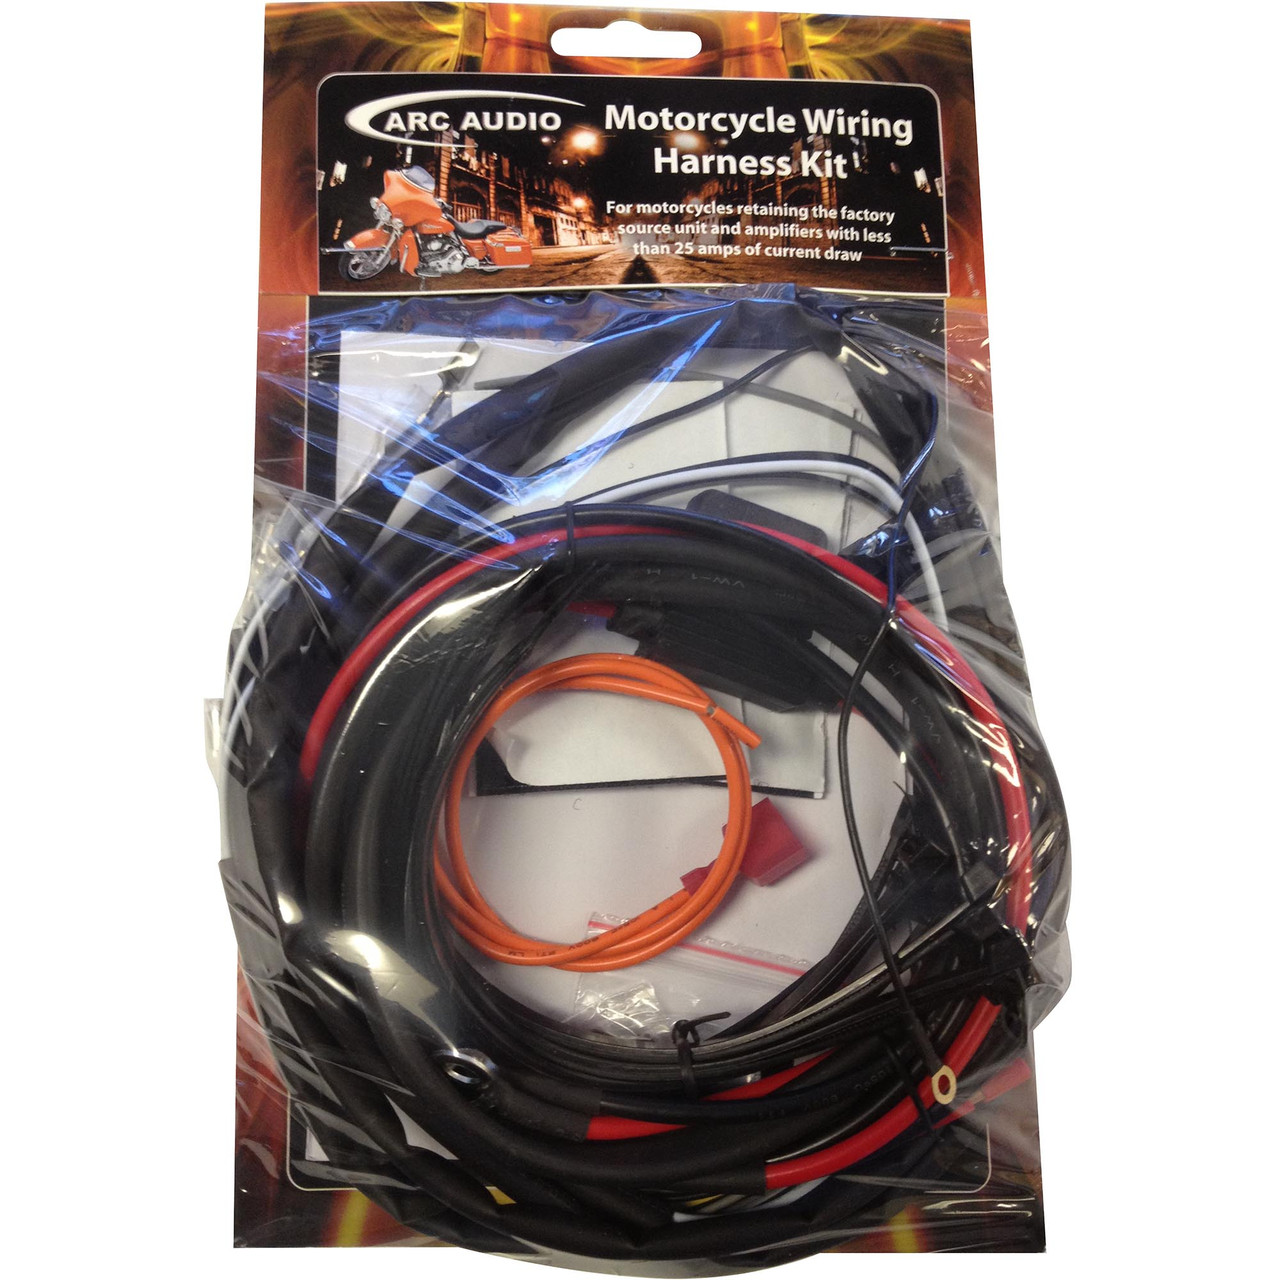 home wiring dynamic audio video llc jamie gannon [ 874 x 1280 Pixel ]